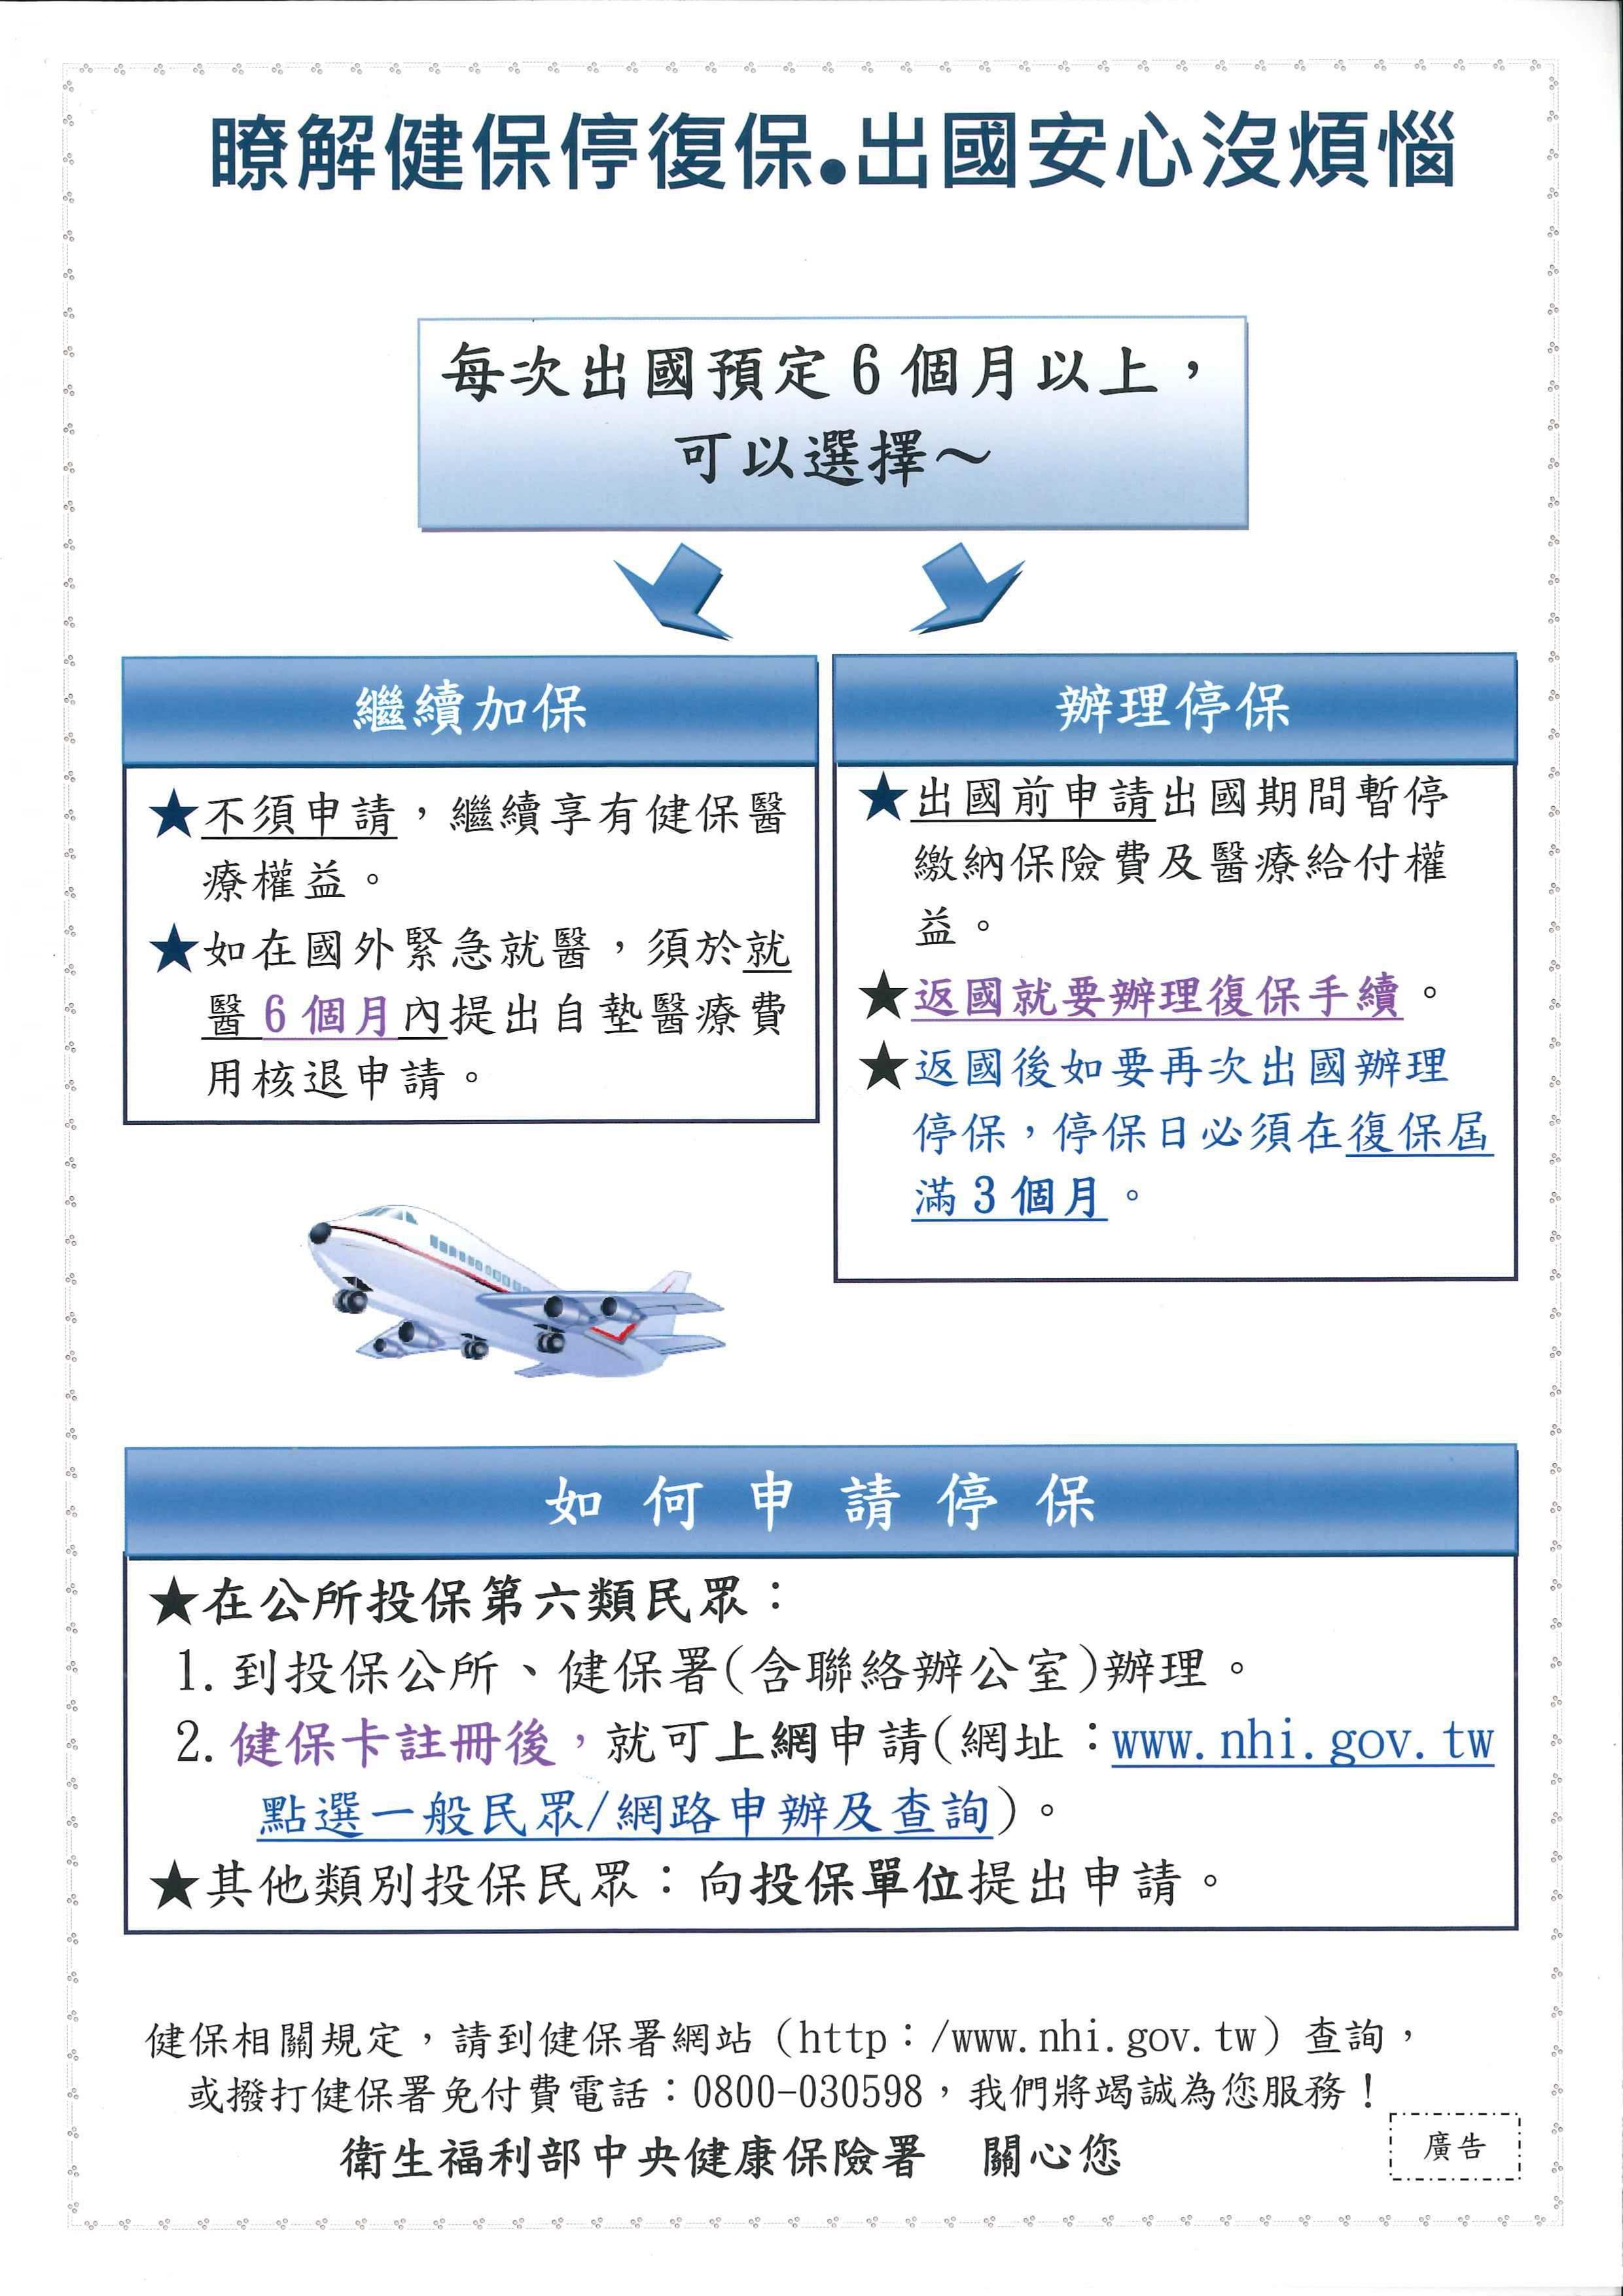 proimages/外籍停復健保行動居家app2.jpg